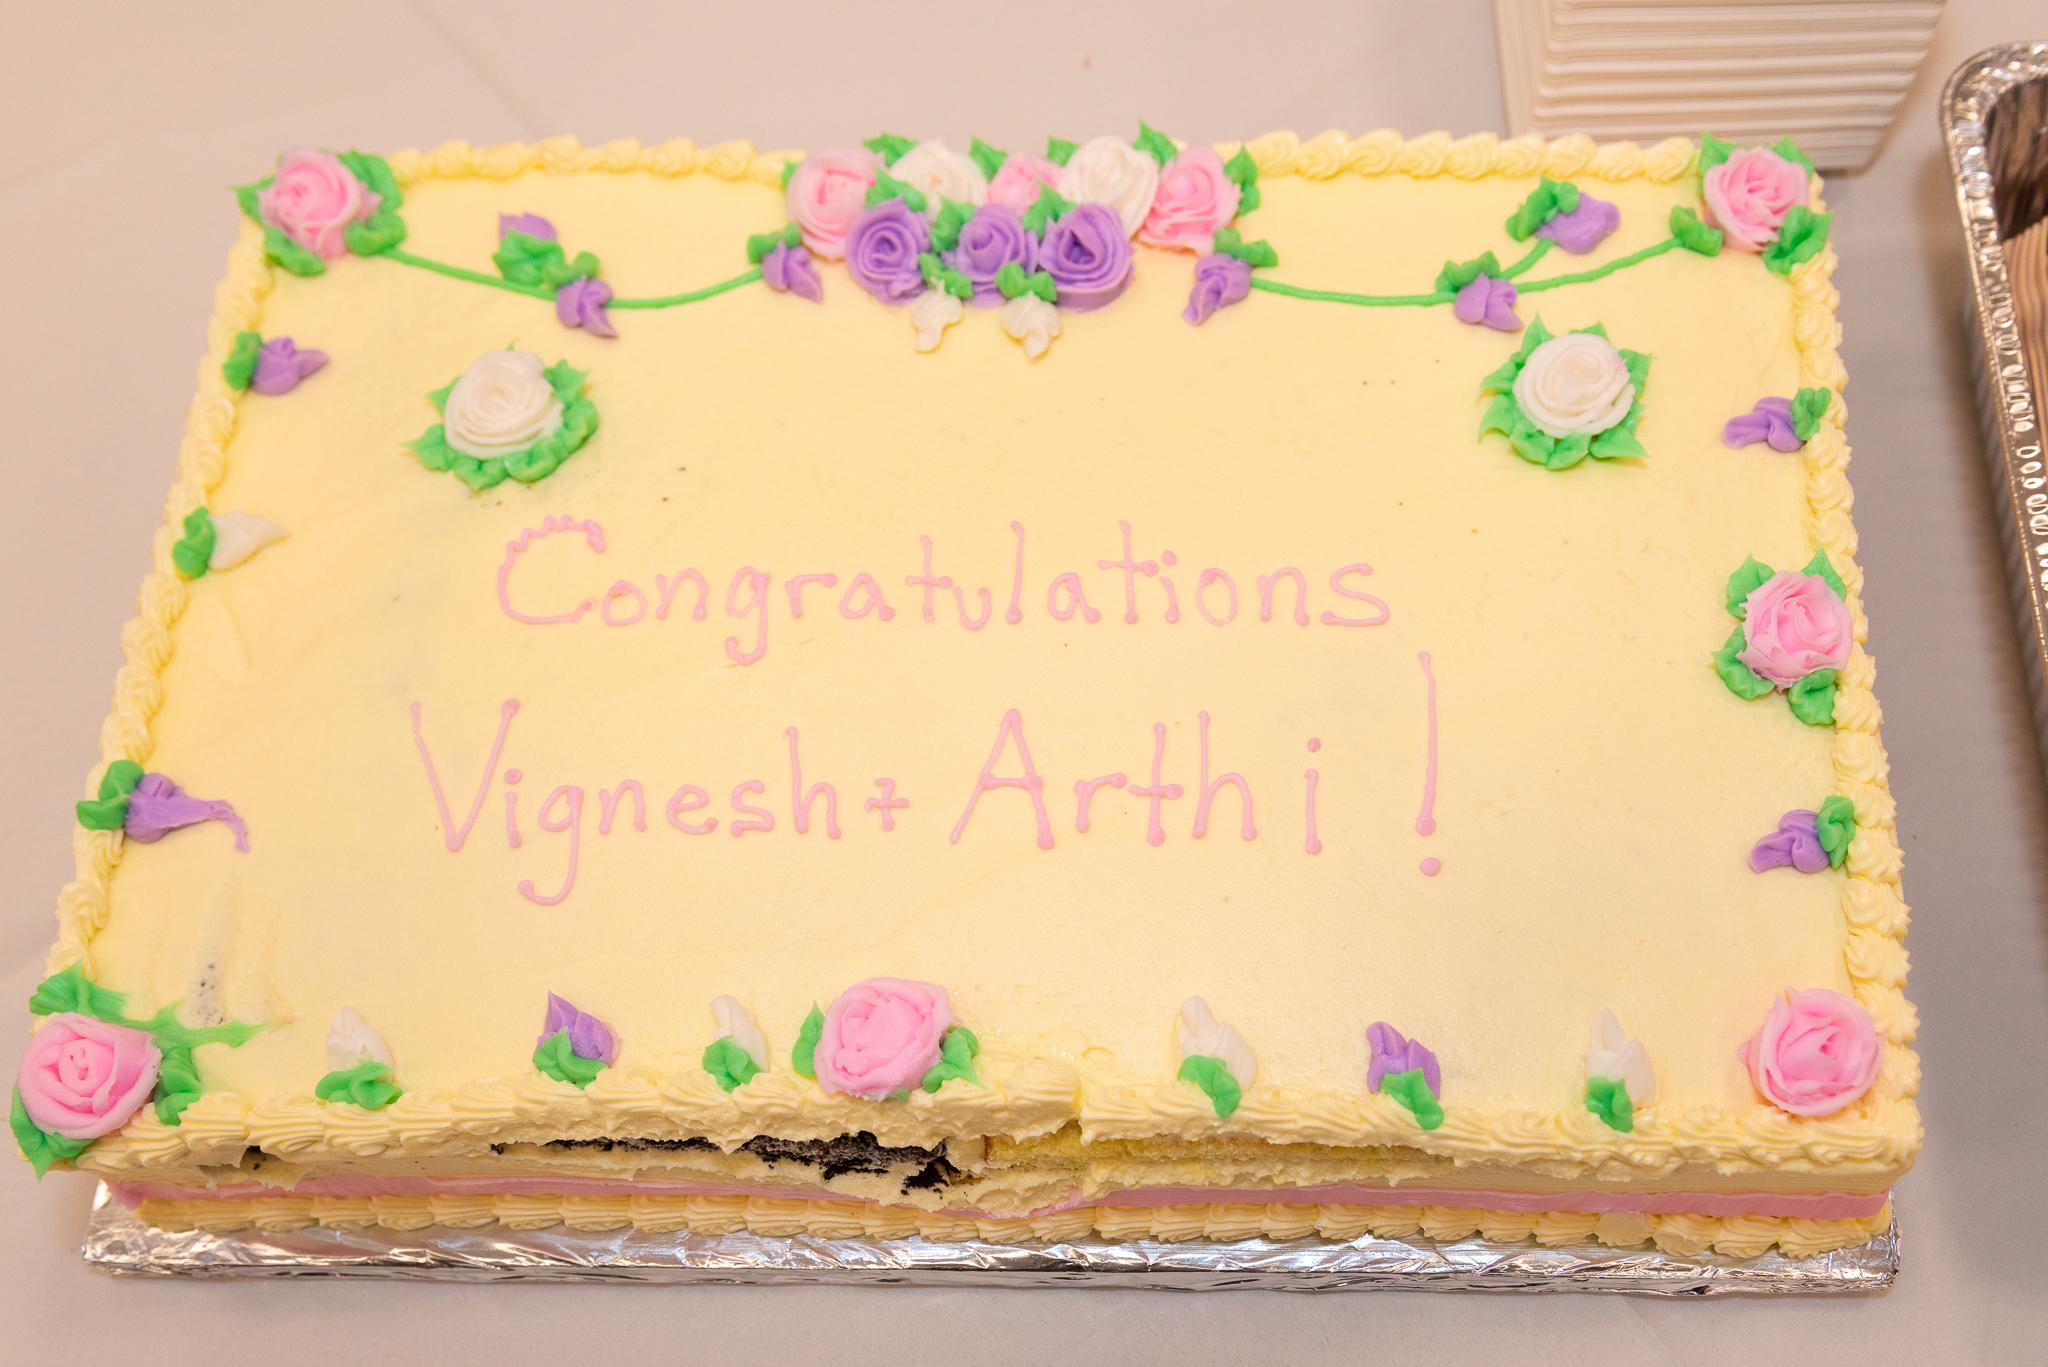 VIGNESH+ARTHI_0213